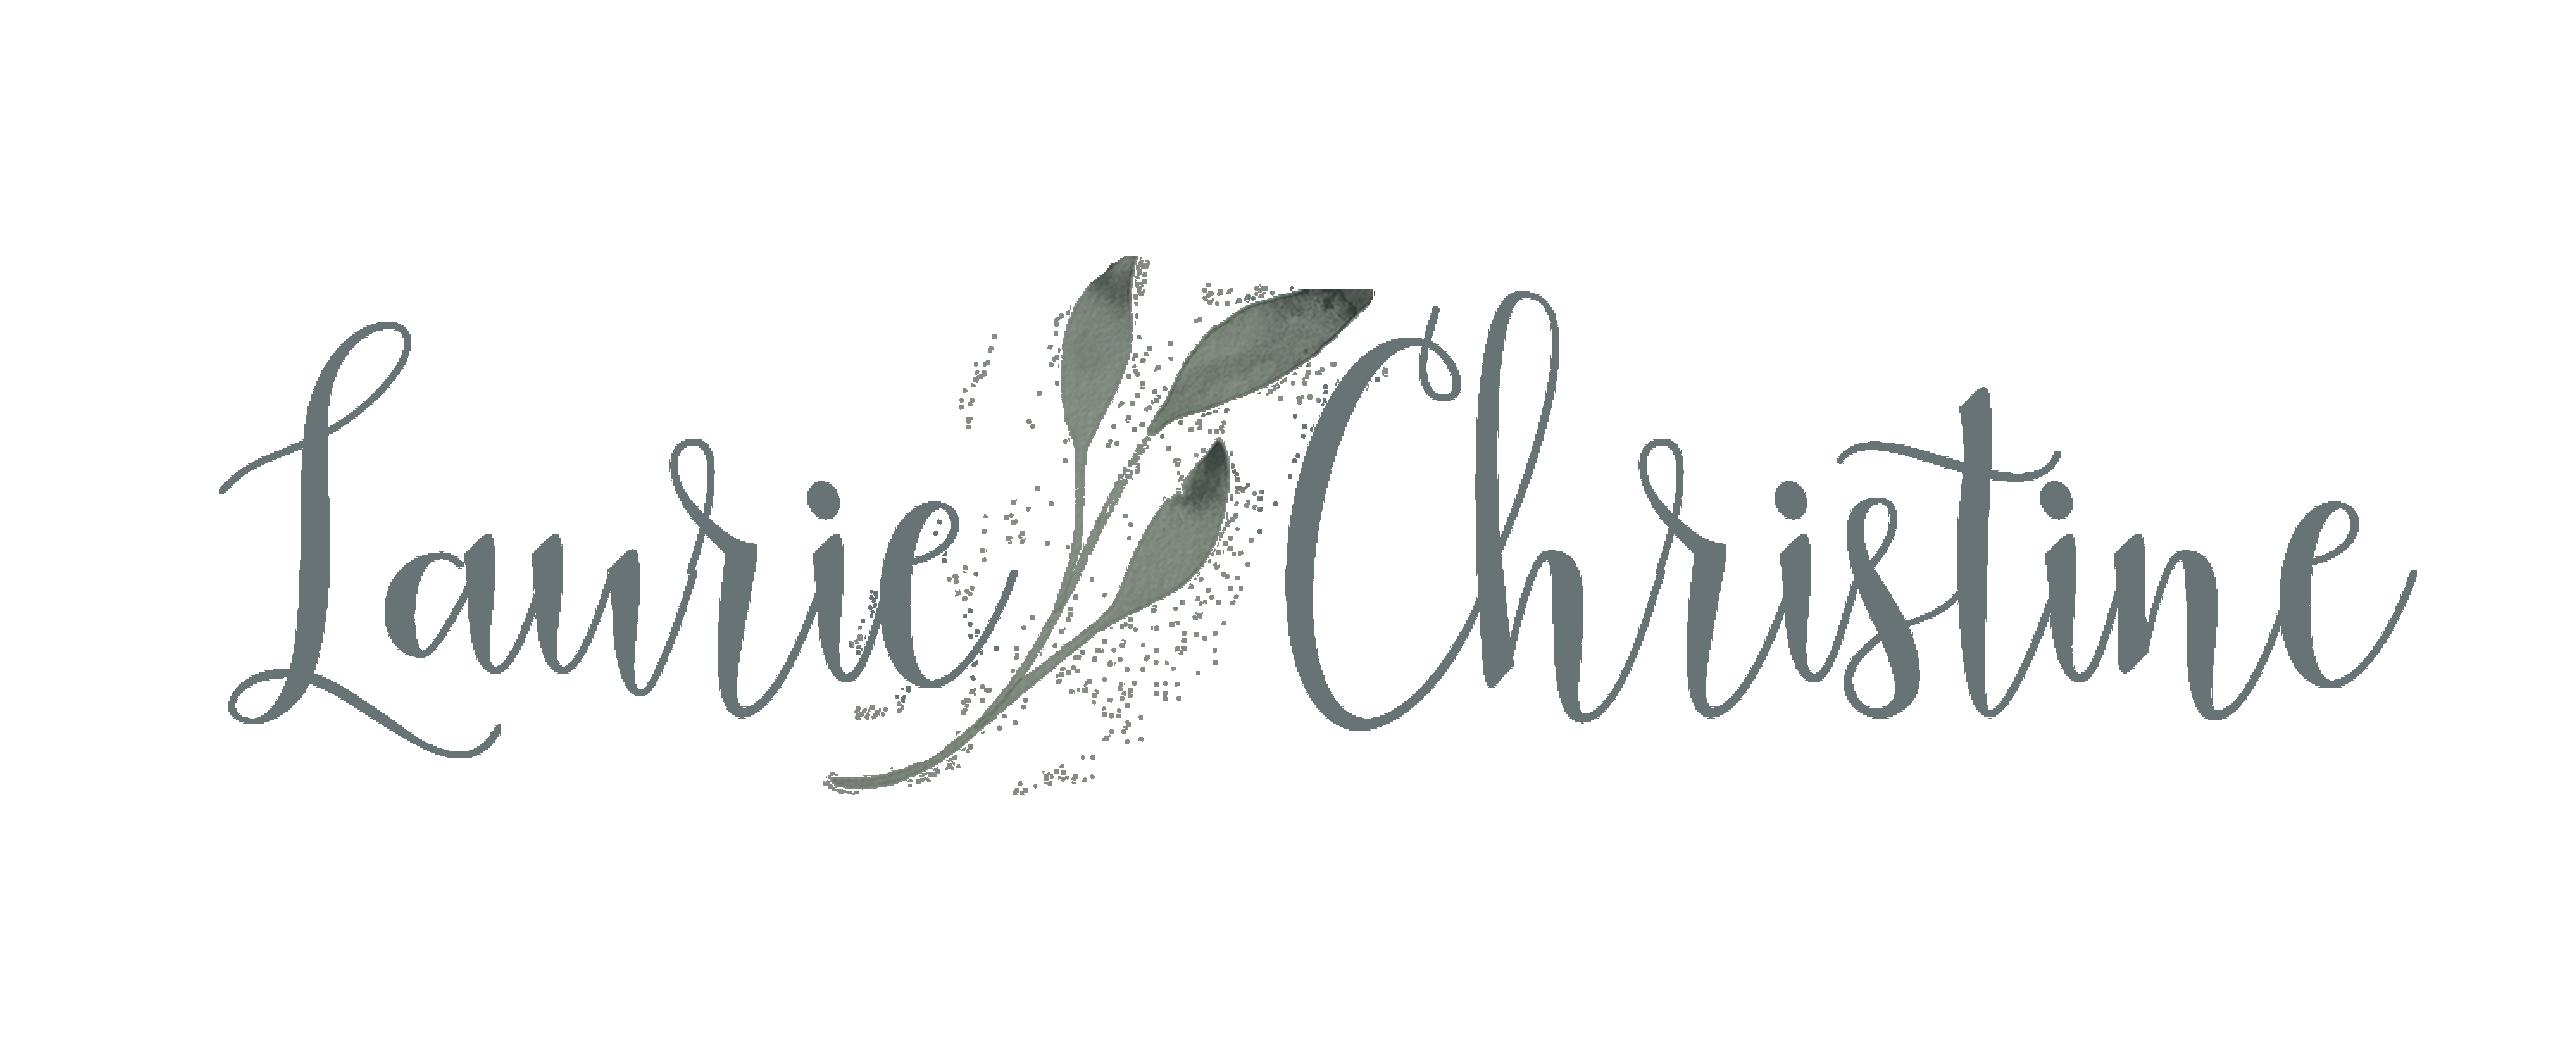 Laurie Christine Creative, new band logo